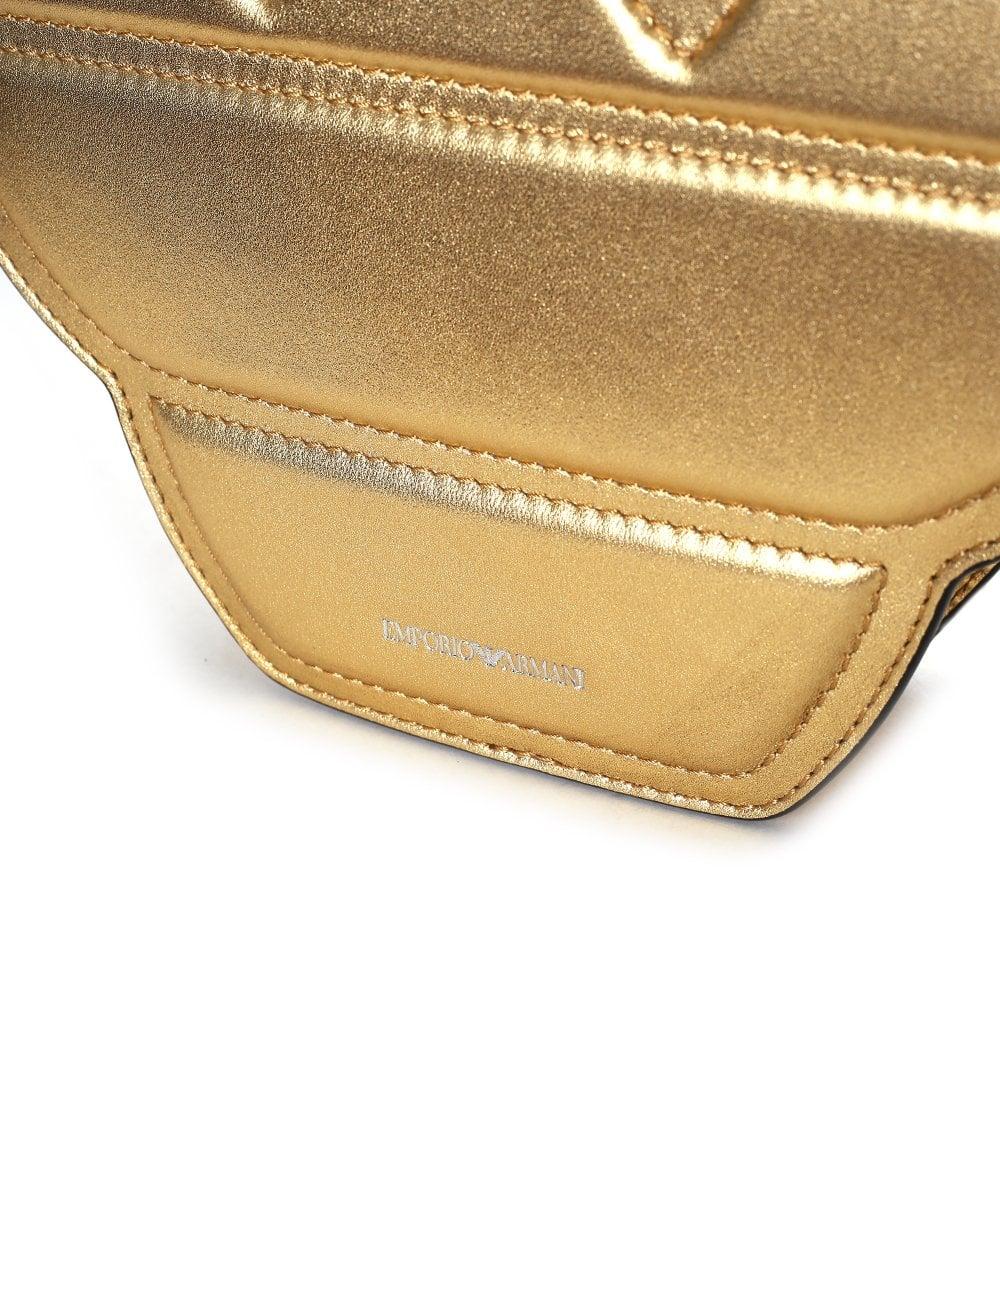 475c44b64c Emporio Armani Women s Eagle Crossbody Bag